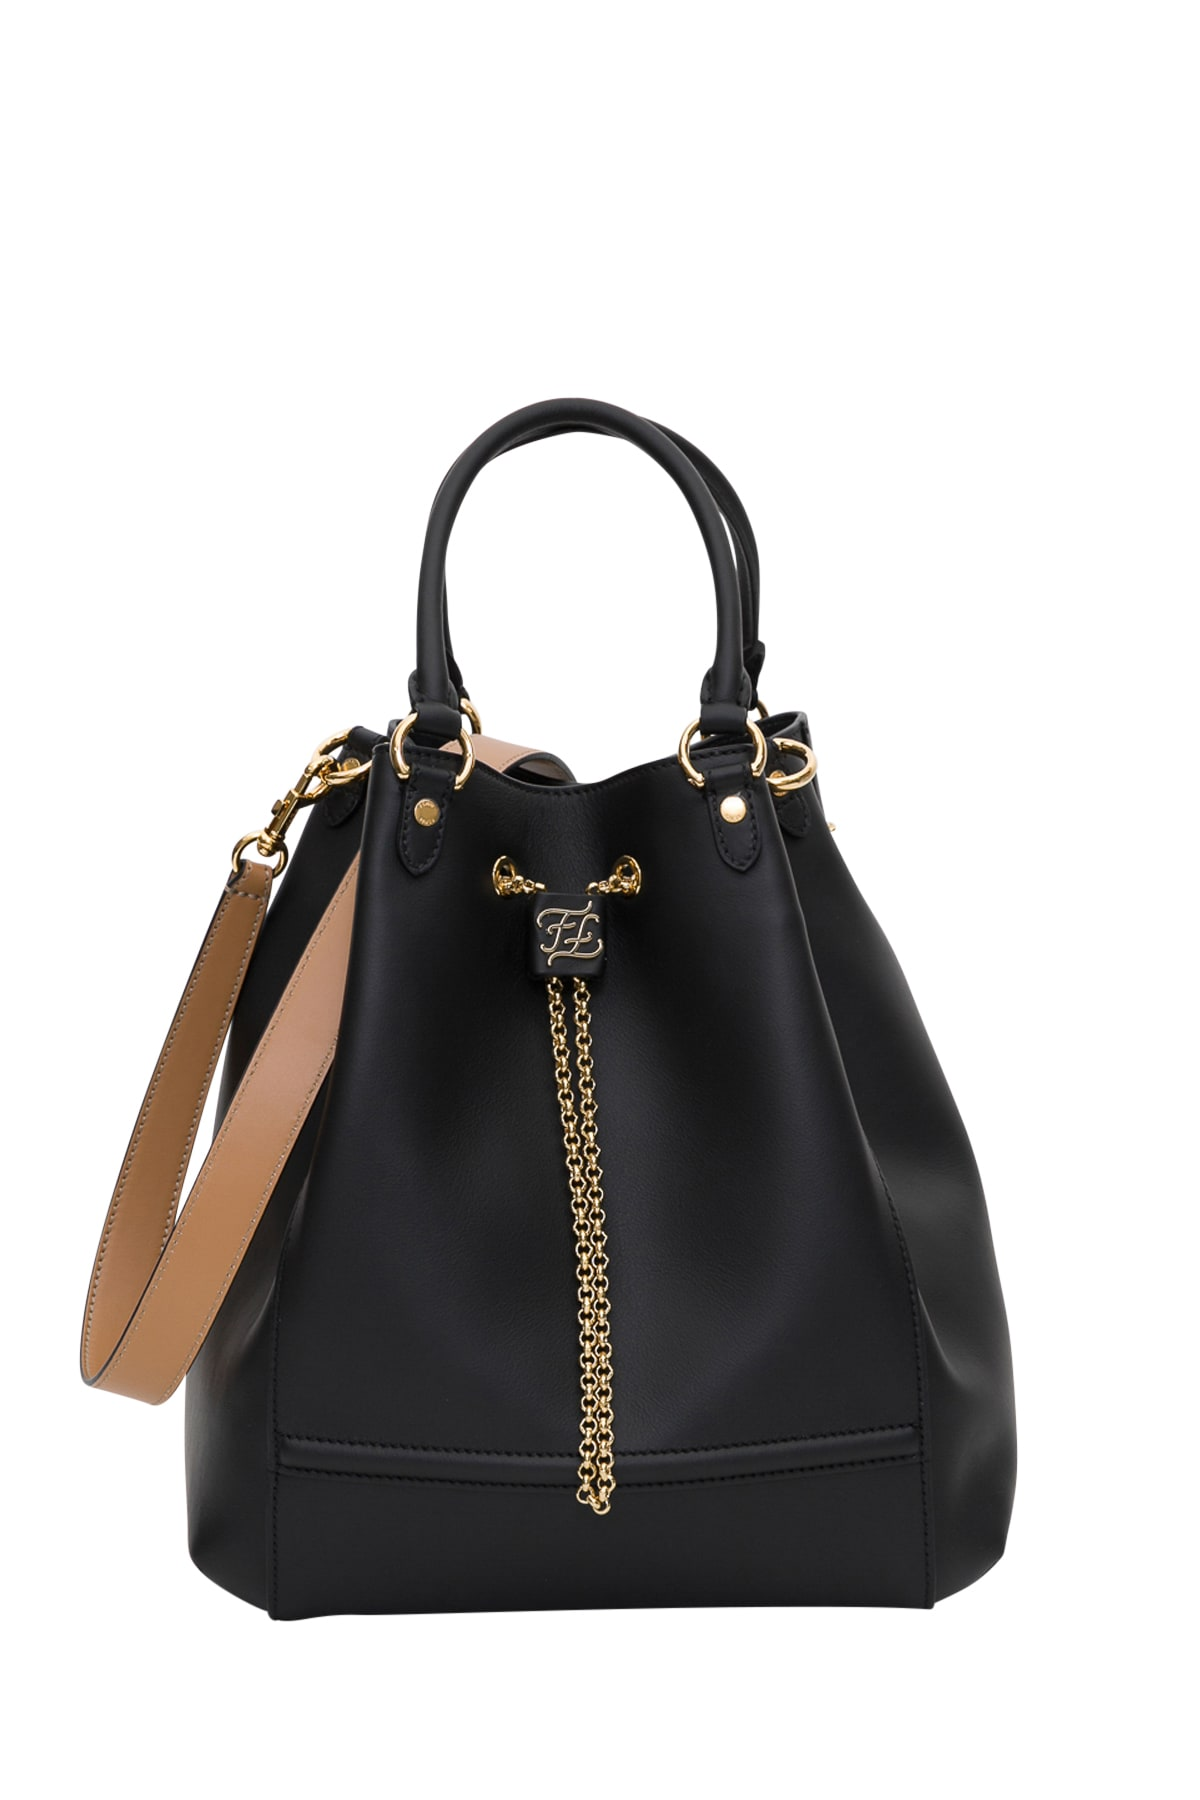 Fendi Chain Bucket Bag